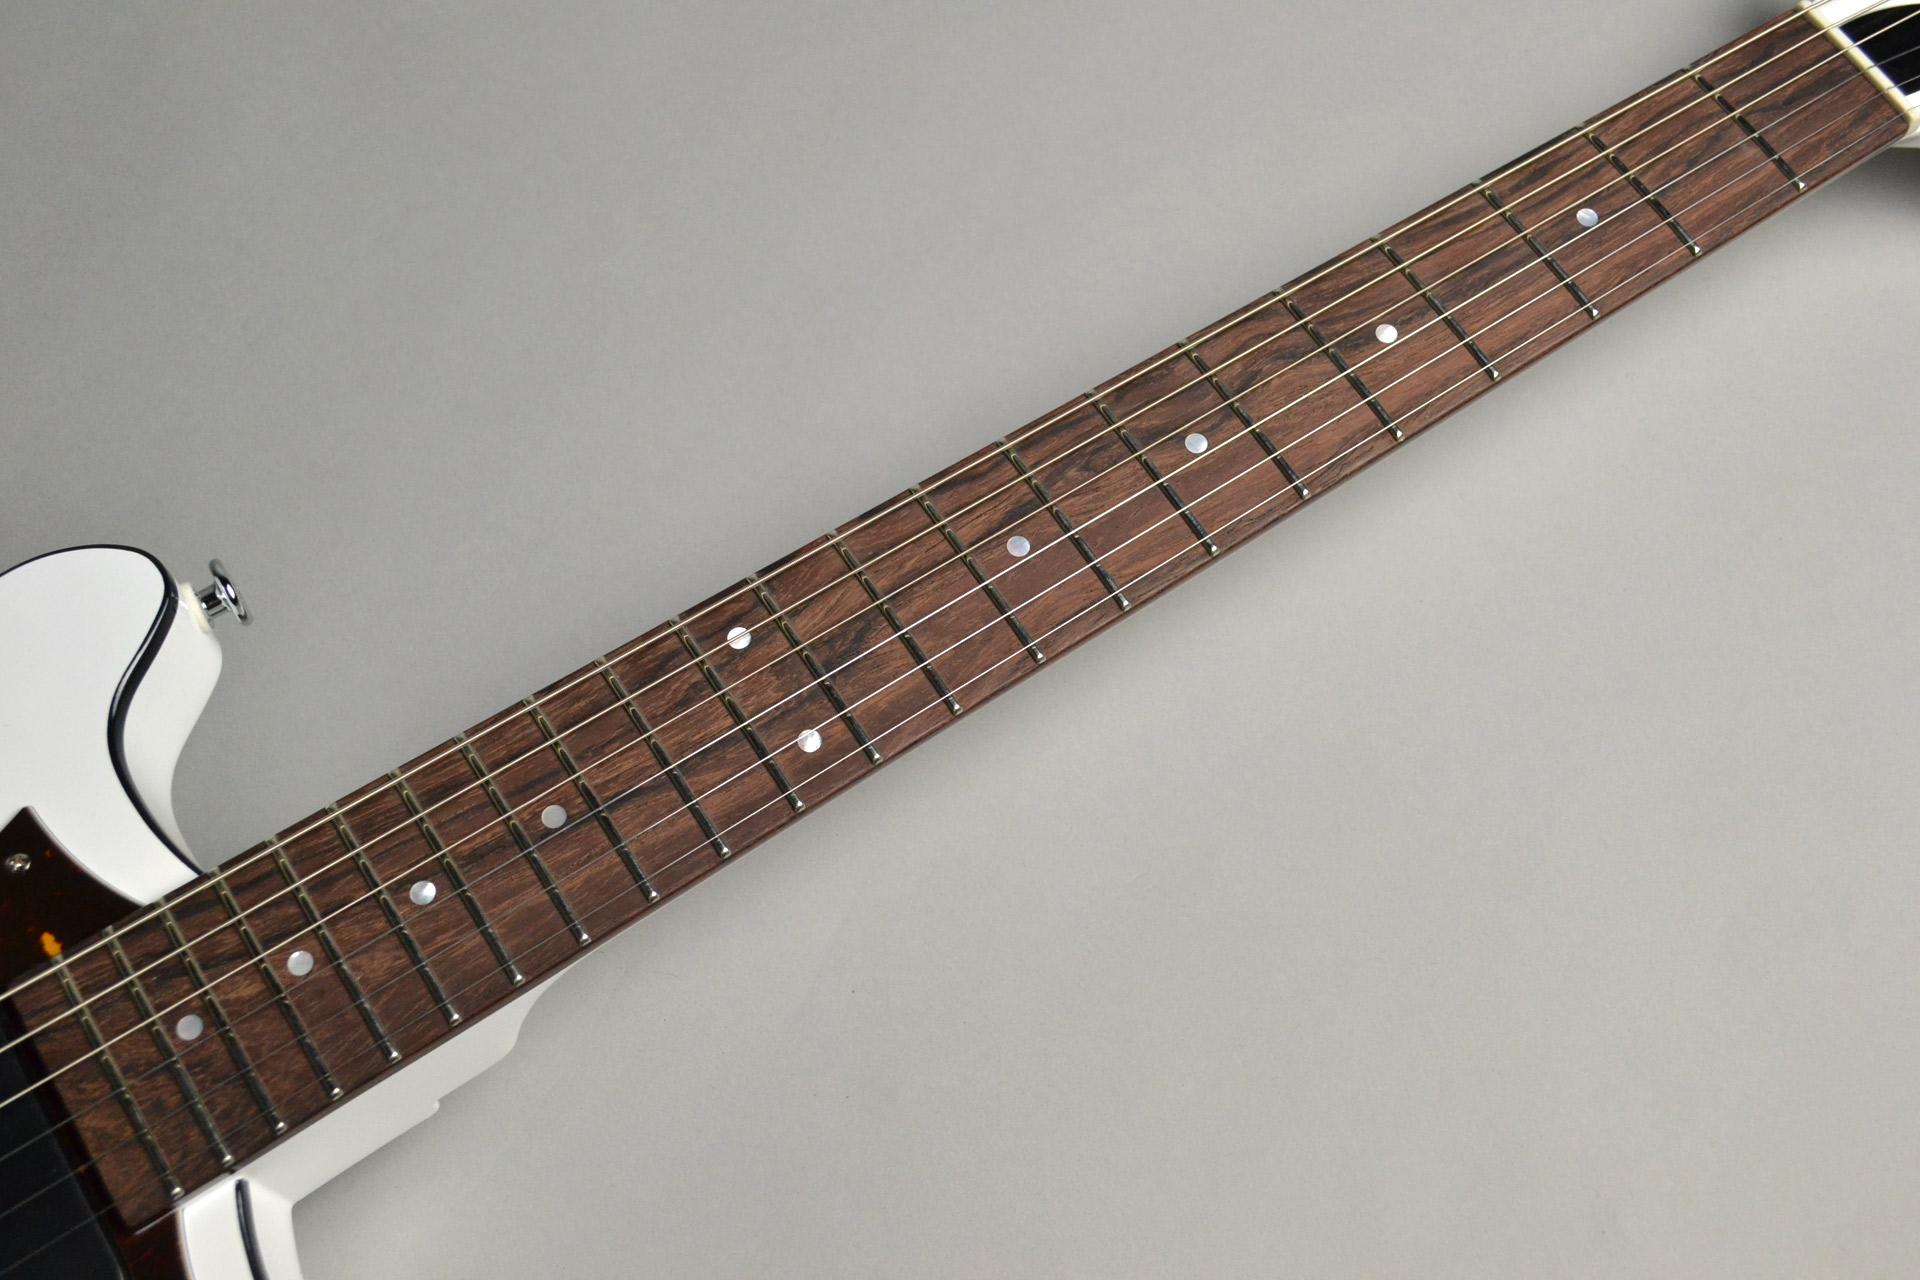 "Kz One Solid 3S23 Kahler Gloss White ""Standard Line""島村楽器限定モデルの全体画像(縦)"